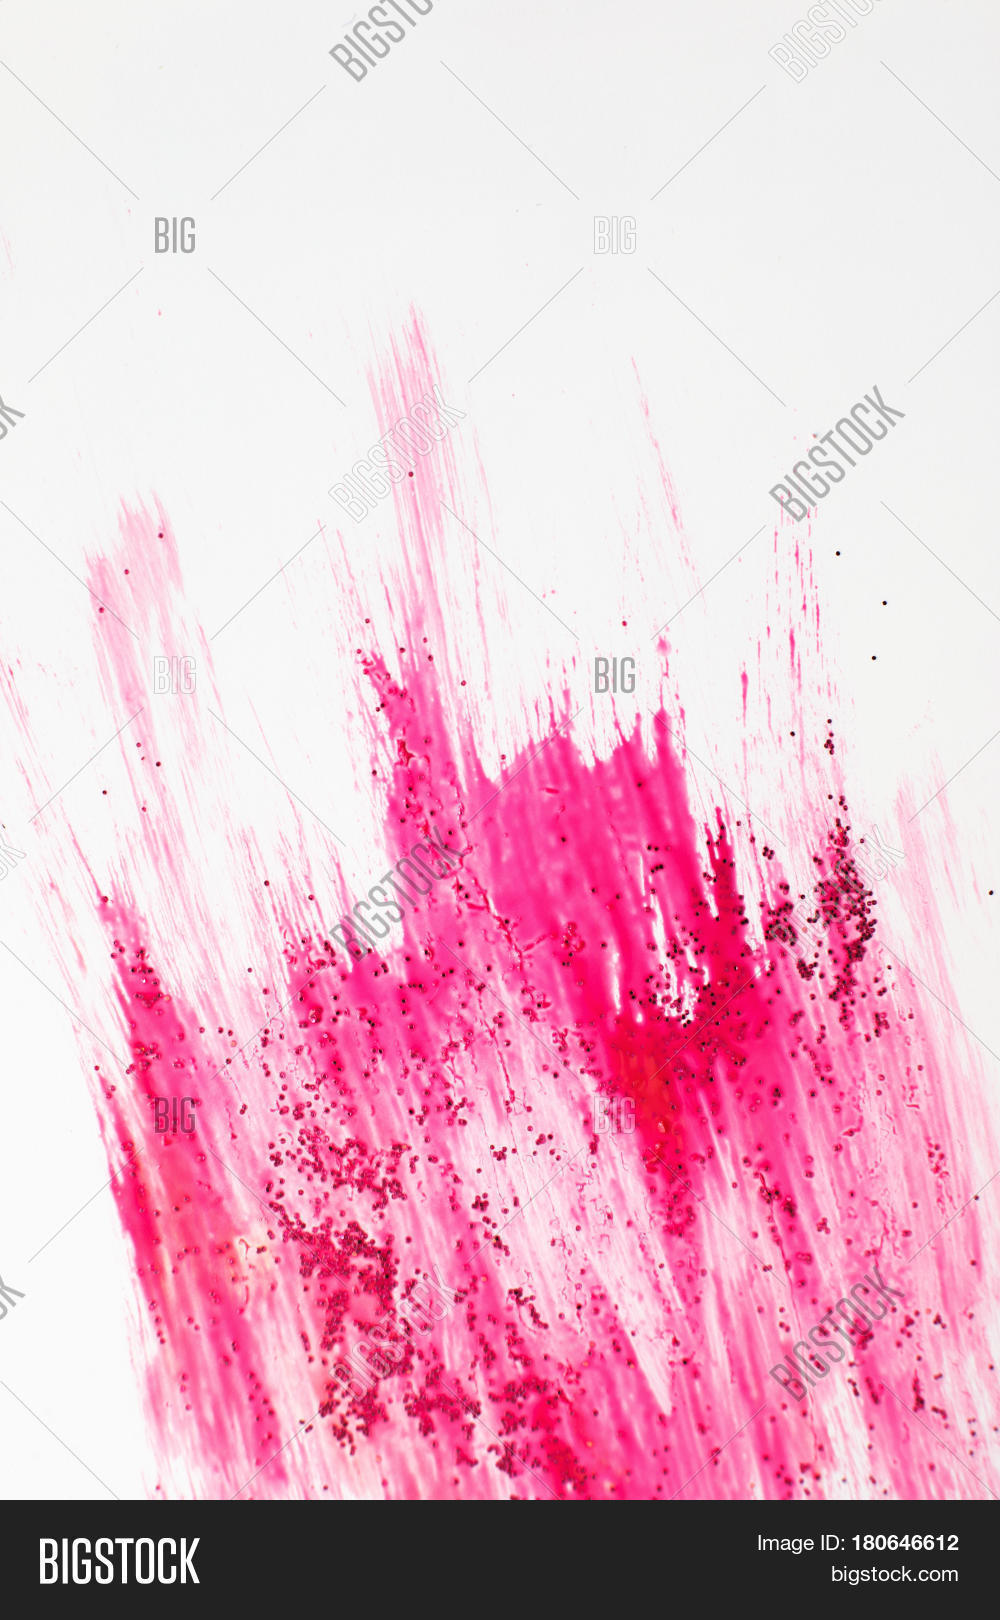 Creative Texture Image & Photo (Free Trial) | Bigstock